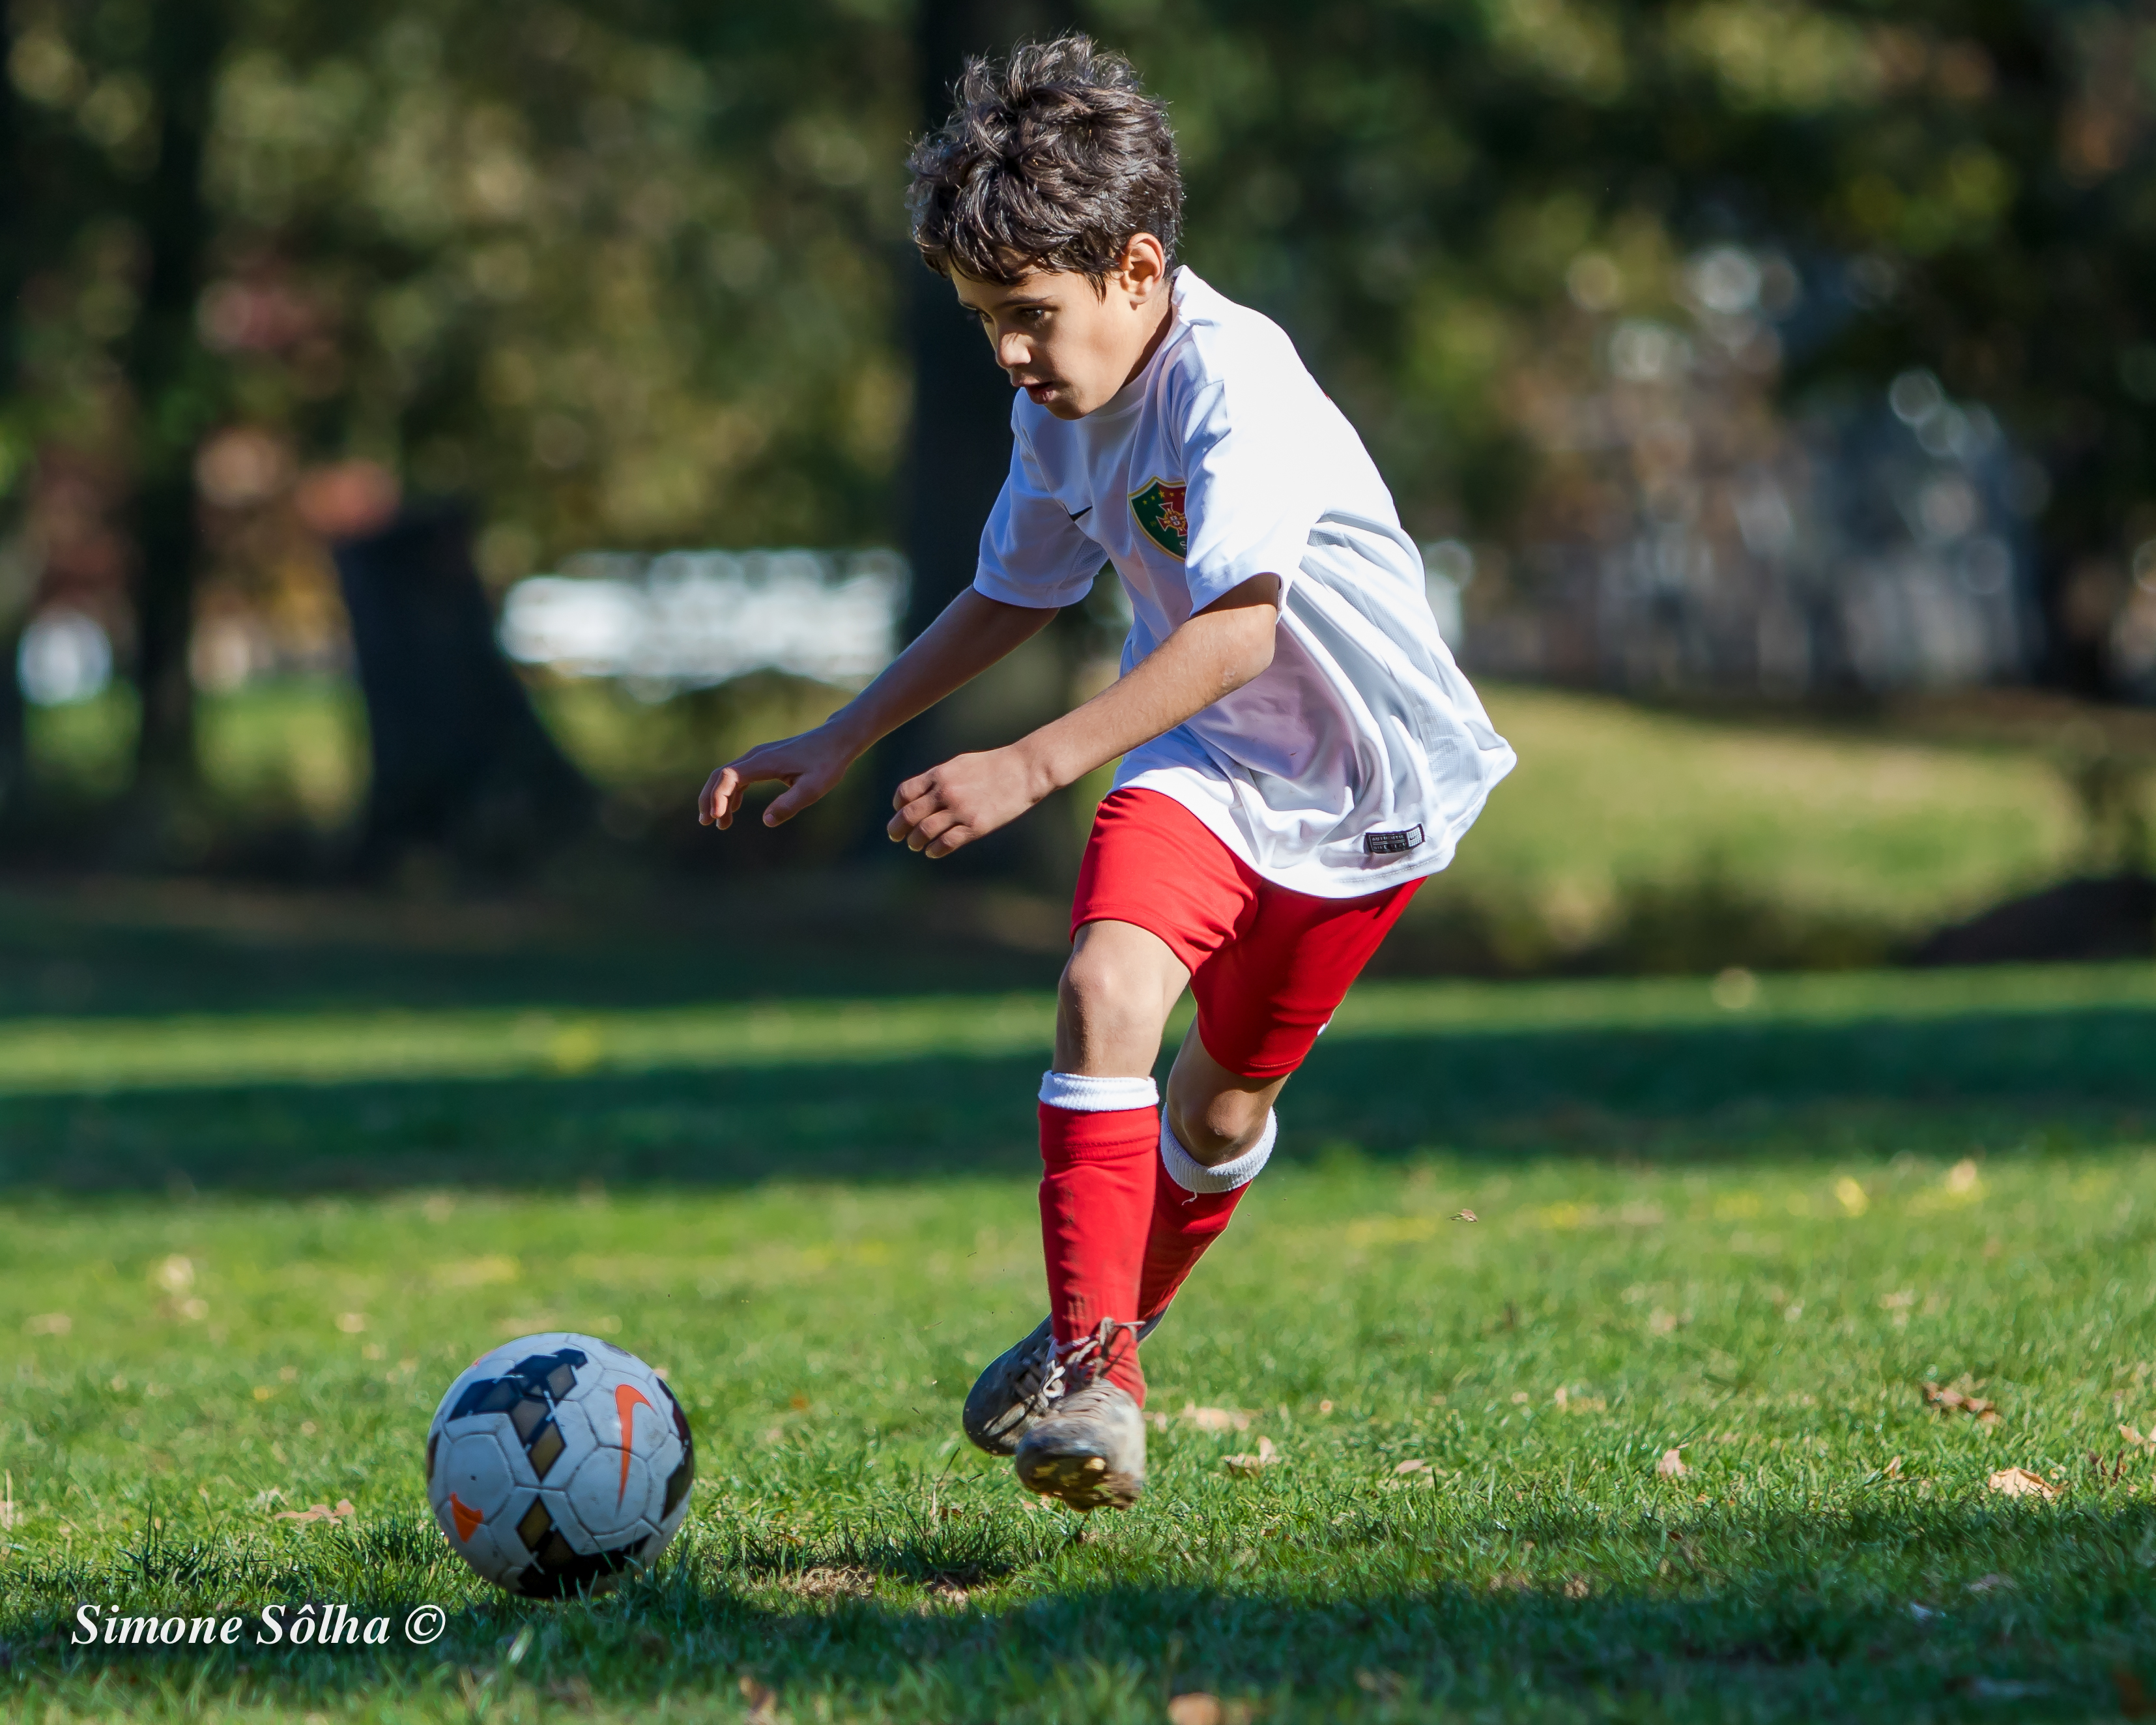 Simone_Sôlha_-_Kids_Soccer_-_Thunder_8_x_2-103